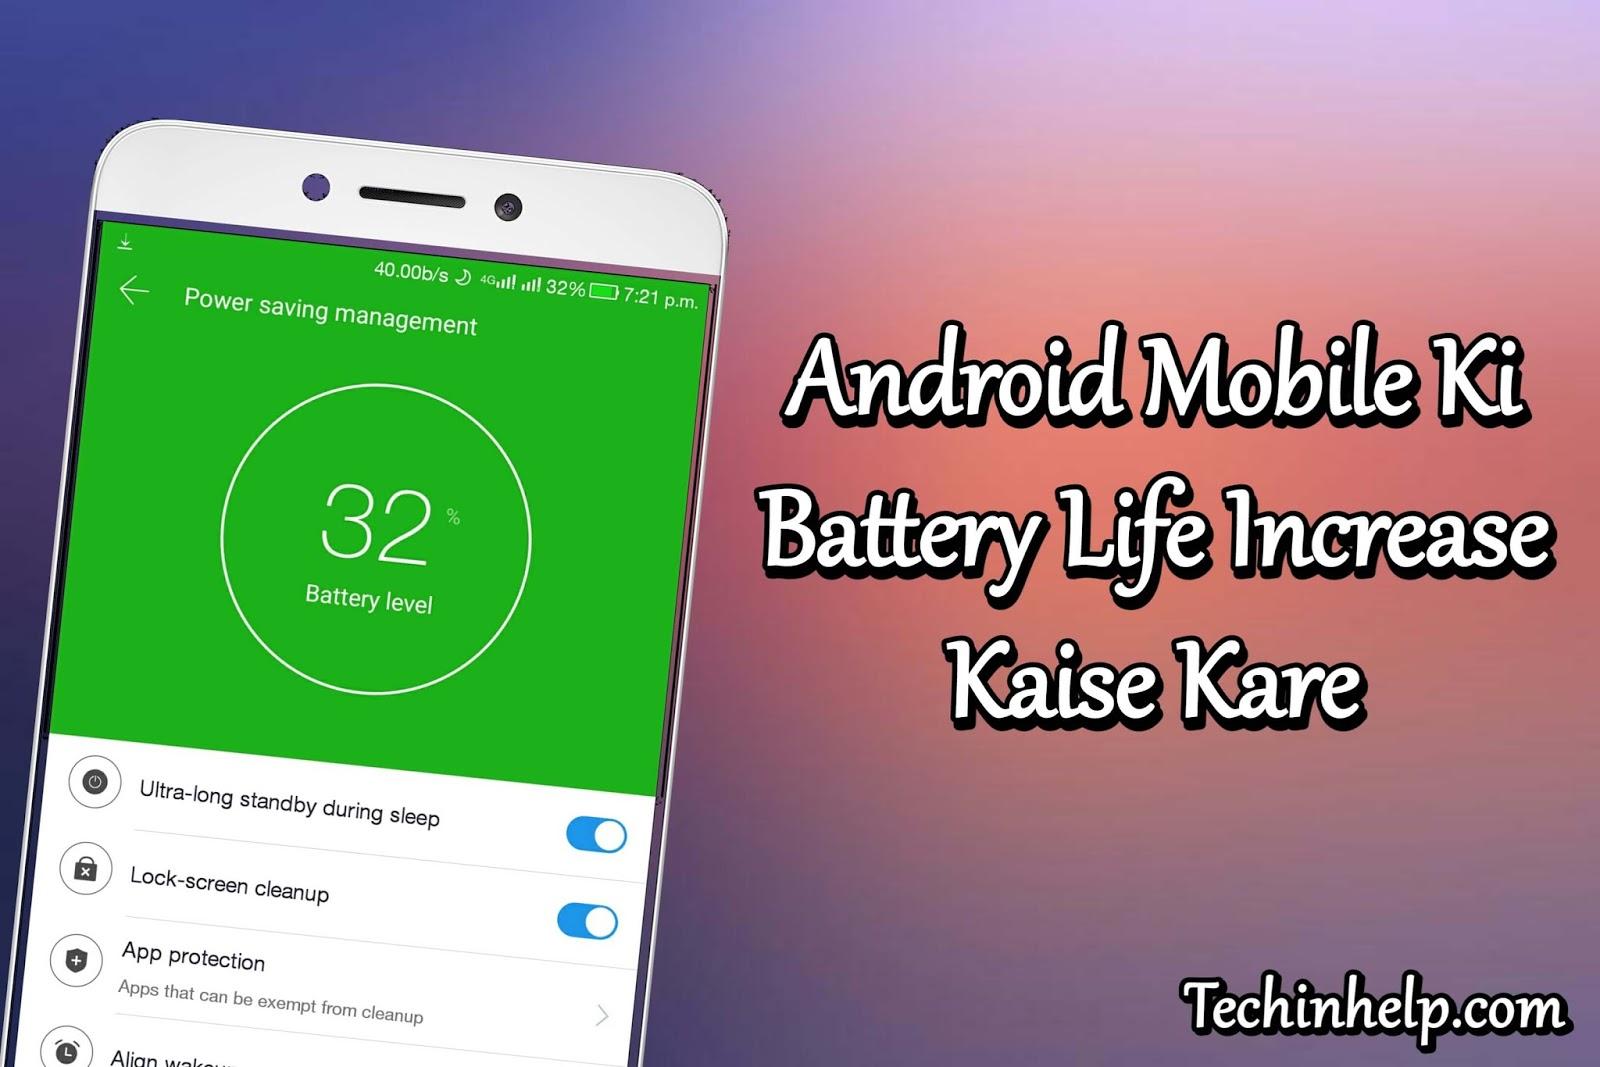 Android Mobile Ki Battery Life Increase Kaise Kare